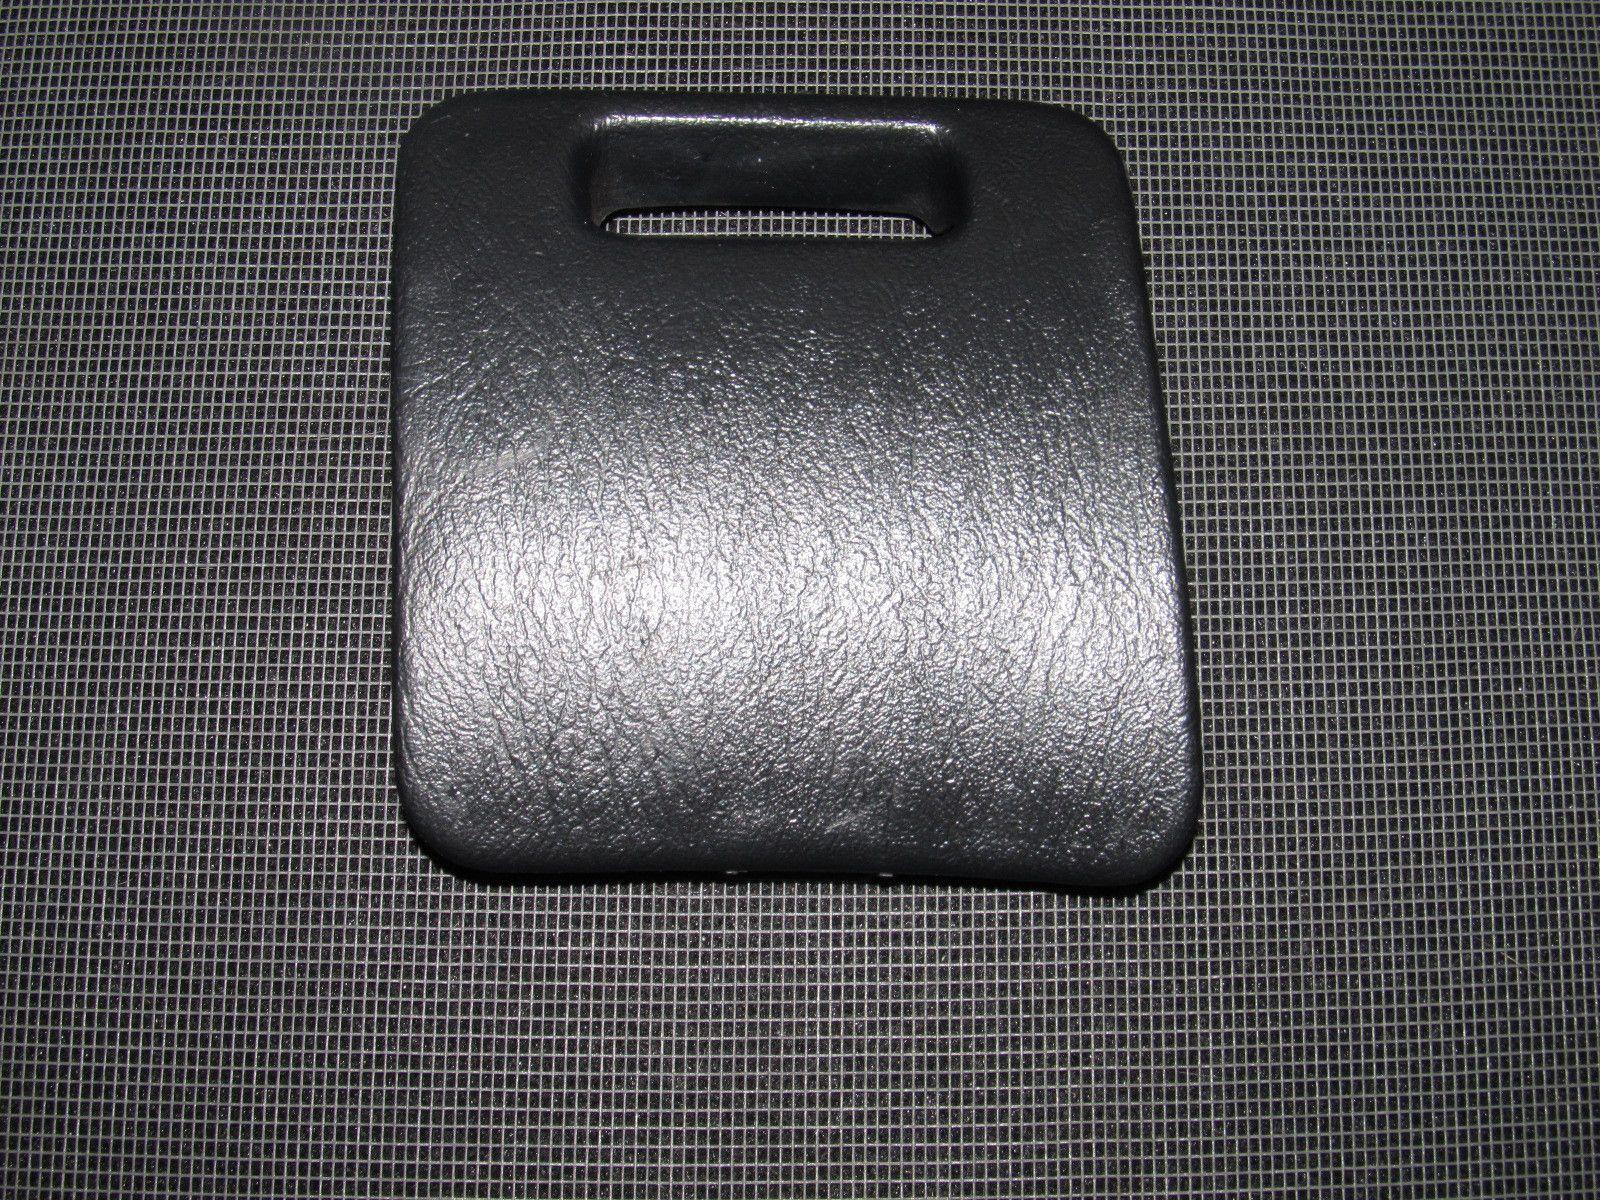 94 95 96 97 98 99 toyota celica oem interior fuse box cover 94 95 96 [ 1600 x 1200 Pixel ]